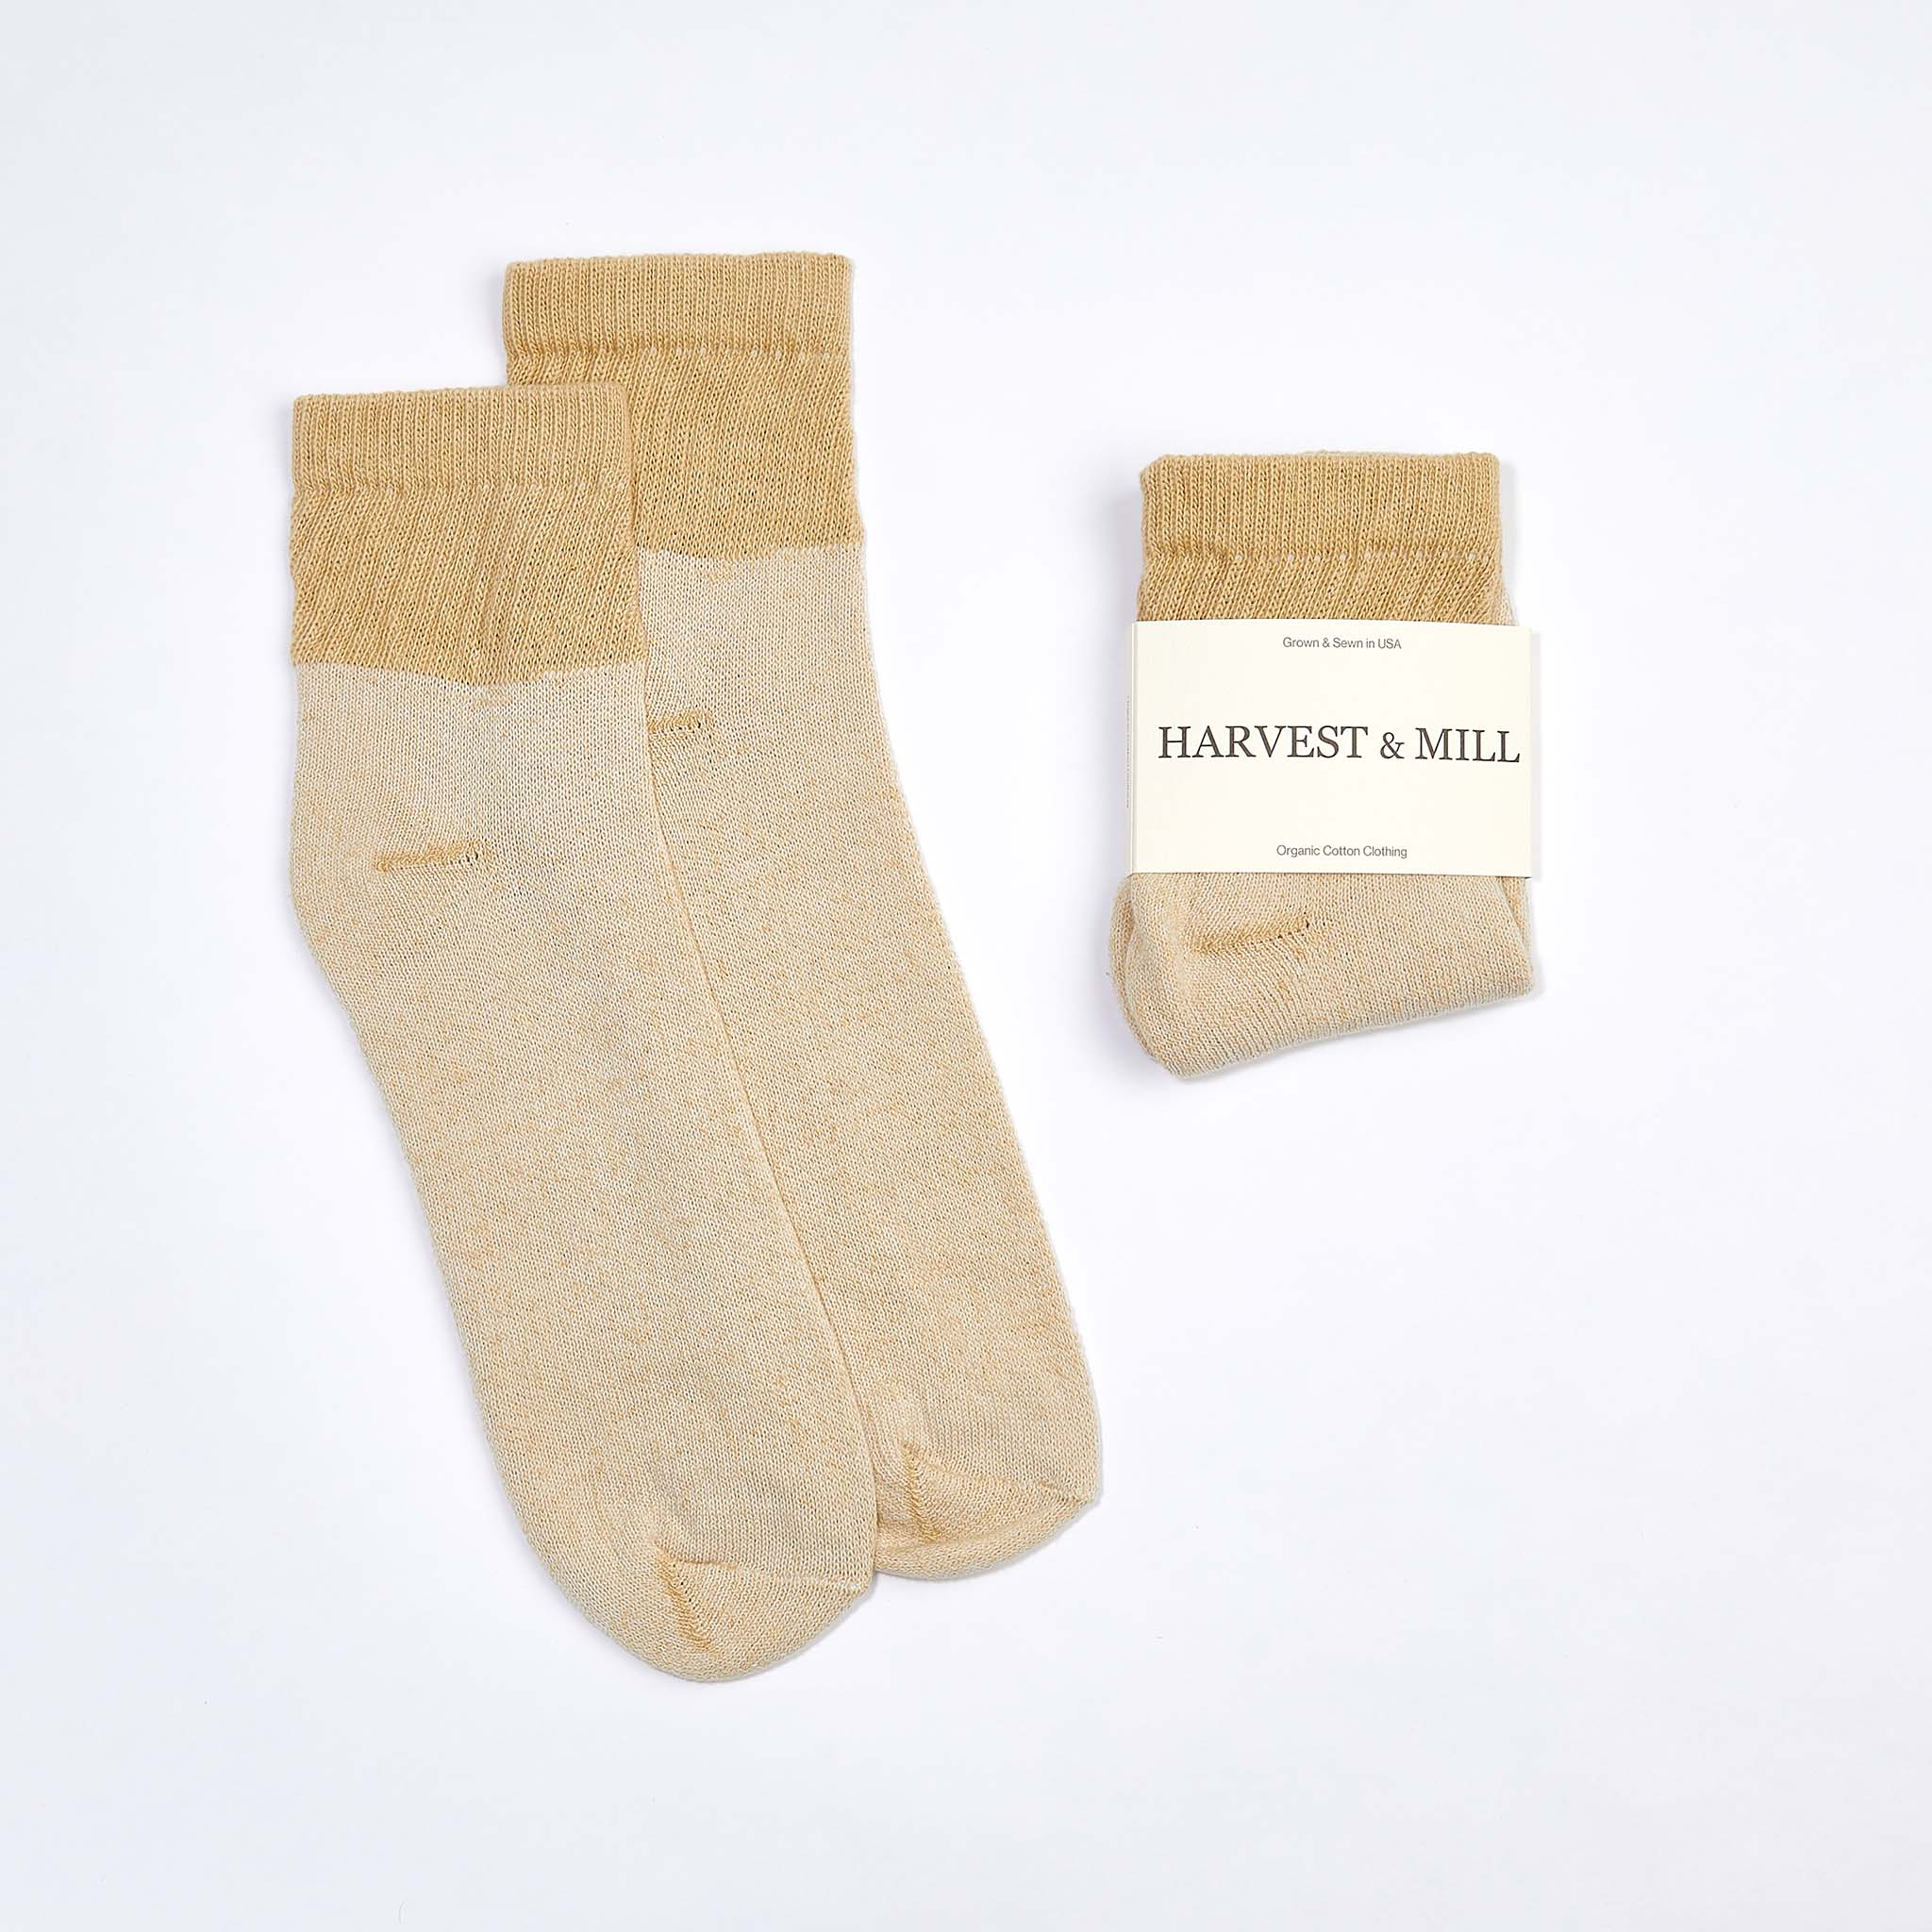 Organic Cotton Socks Tan-Green Ankle $9